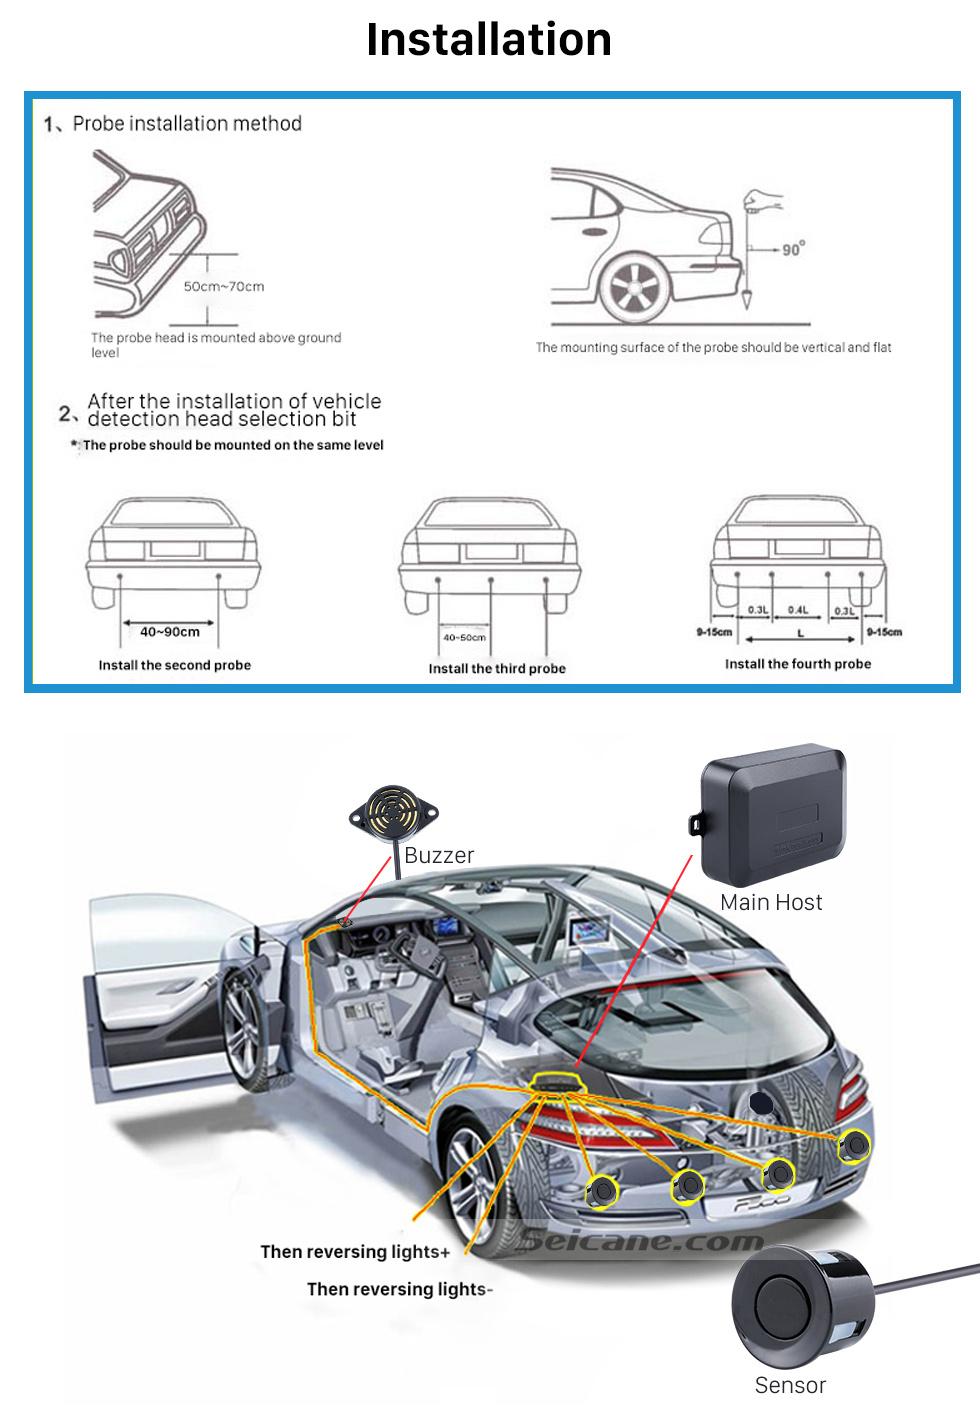 Installation Seicane Dual Core CPU Car Rearview Parking Sensor Detector Video Radar System Rear View Camera Monitor for Universal Car